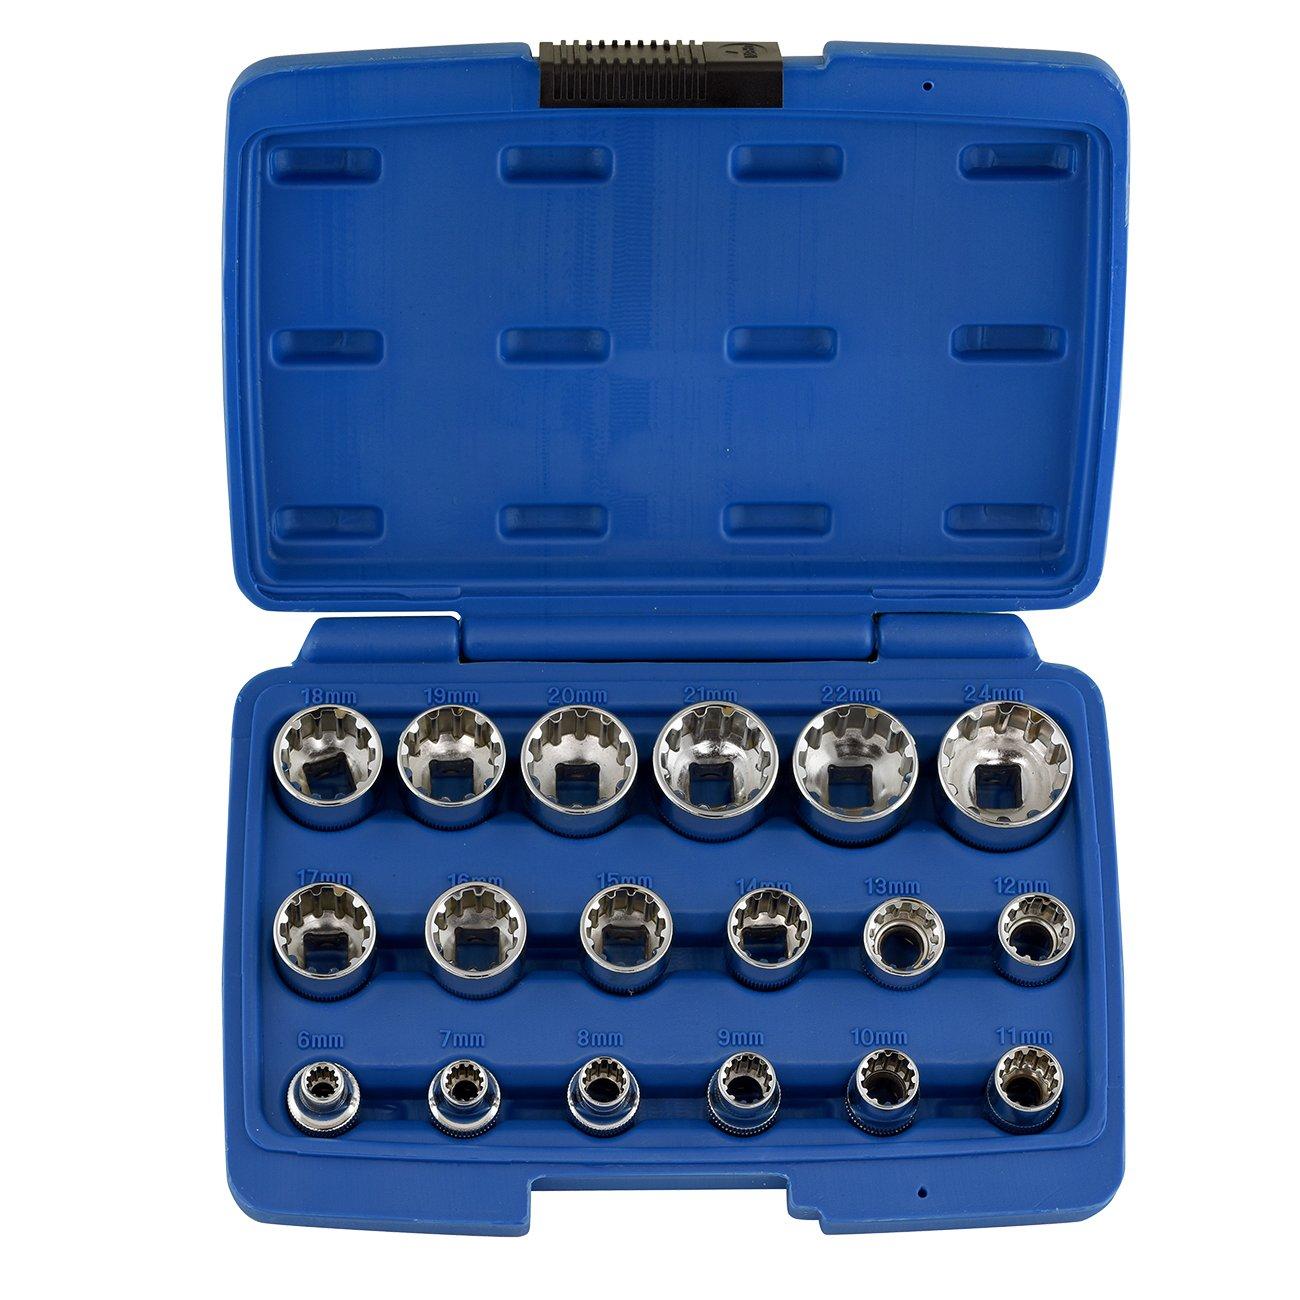 Neiko 02489A Drive Universal Spline Socket Set (19 Piece), 1/2' 1/2 Ridgerock Tools Inc.